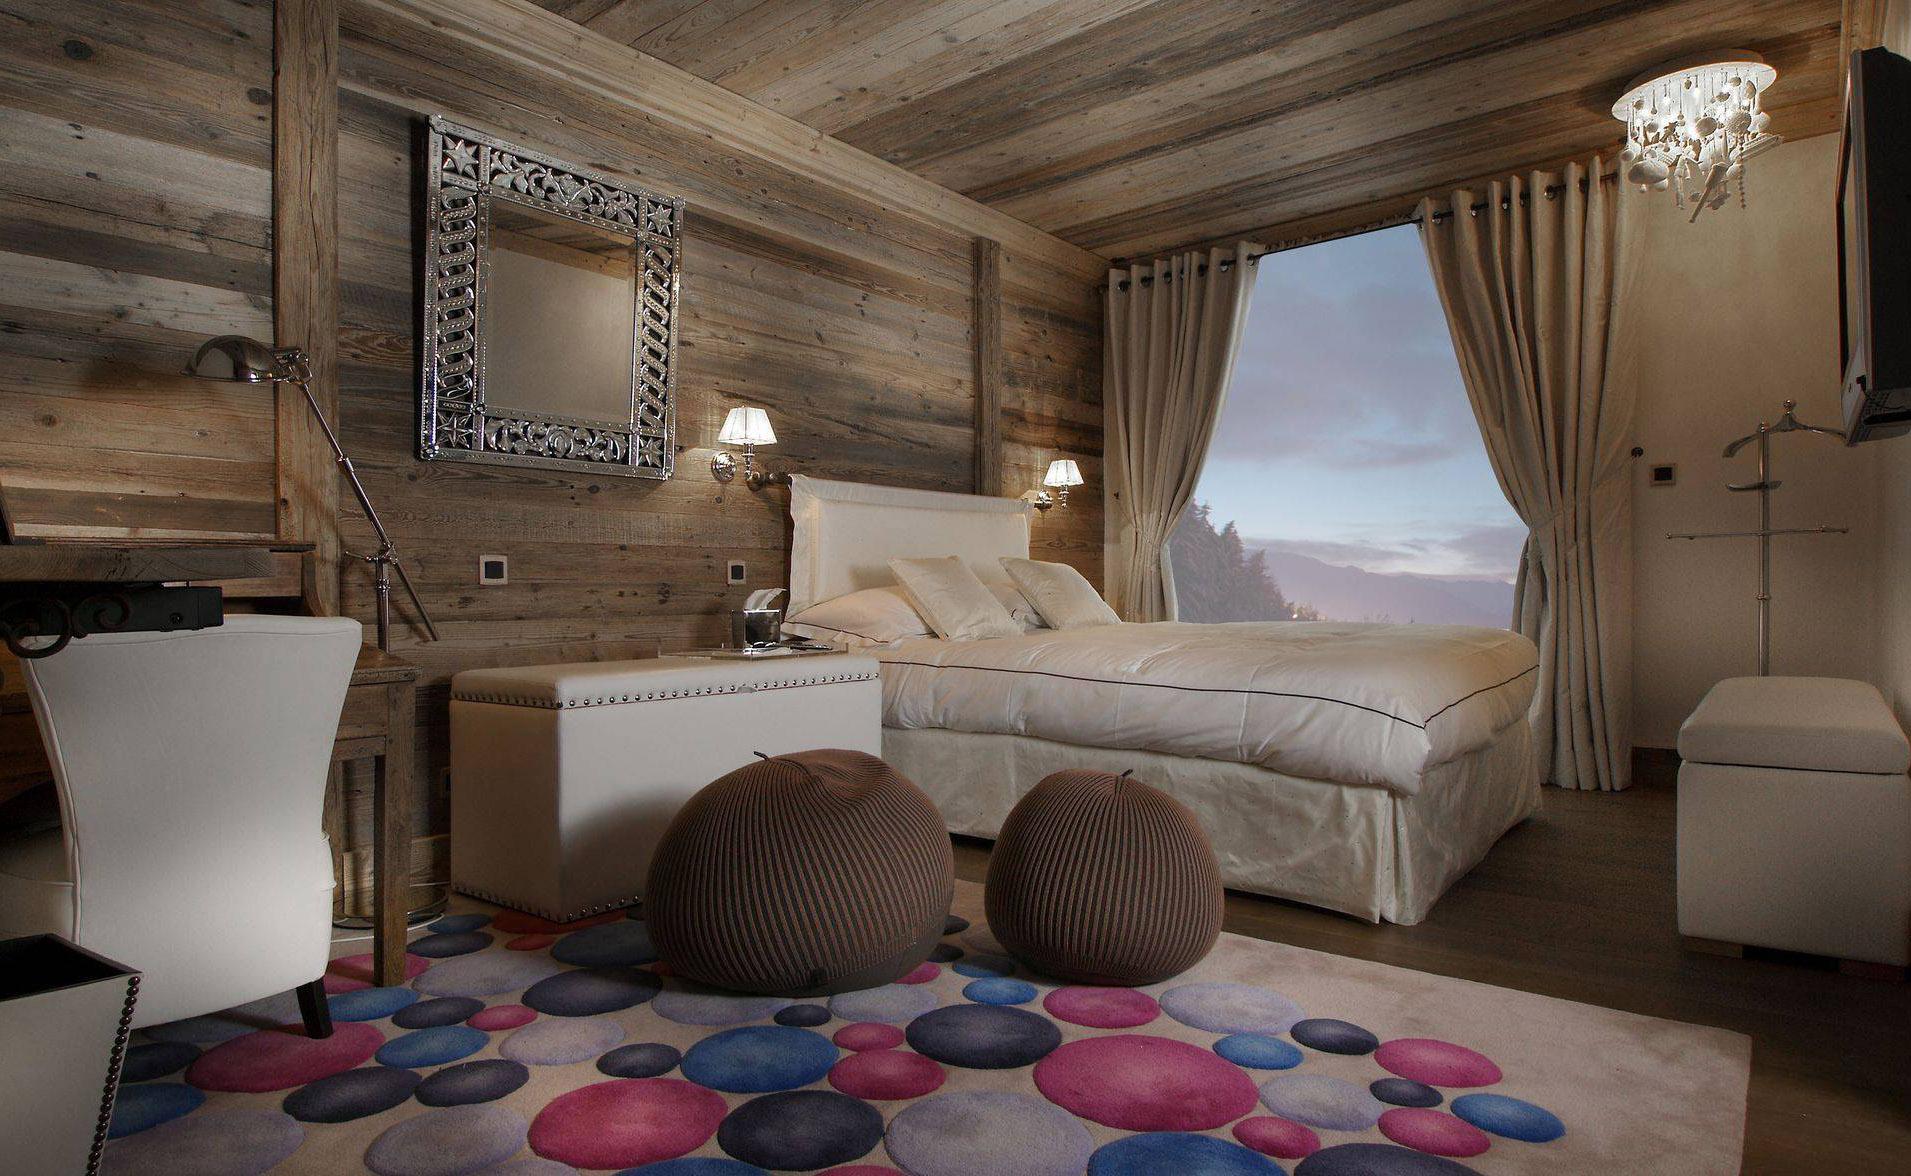 Lovelydays luxury service apartment rental - Courchevel - Great Roc Chalet - Partner - 7 bedrooms - 6 bathrooms - Queen bed - 40635fdf9bb3 - Lovelydays